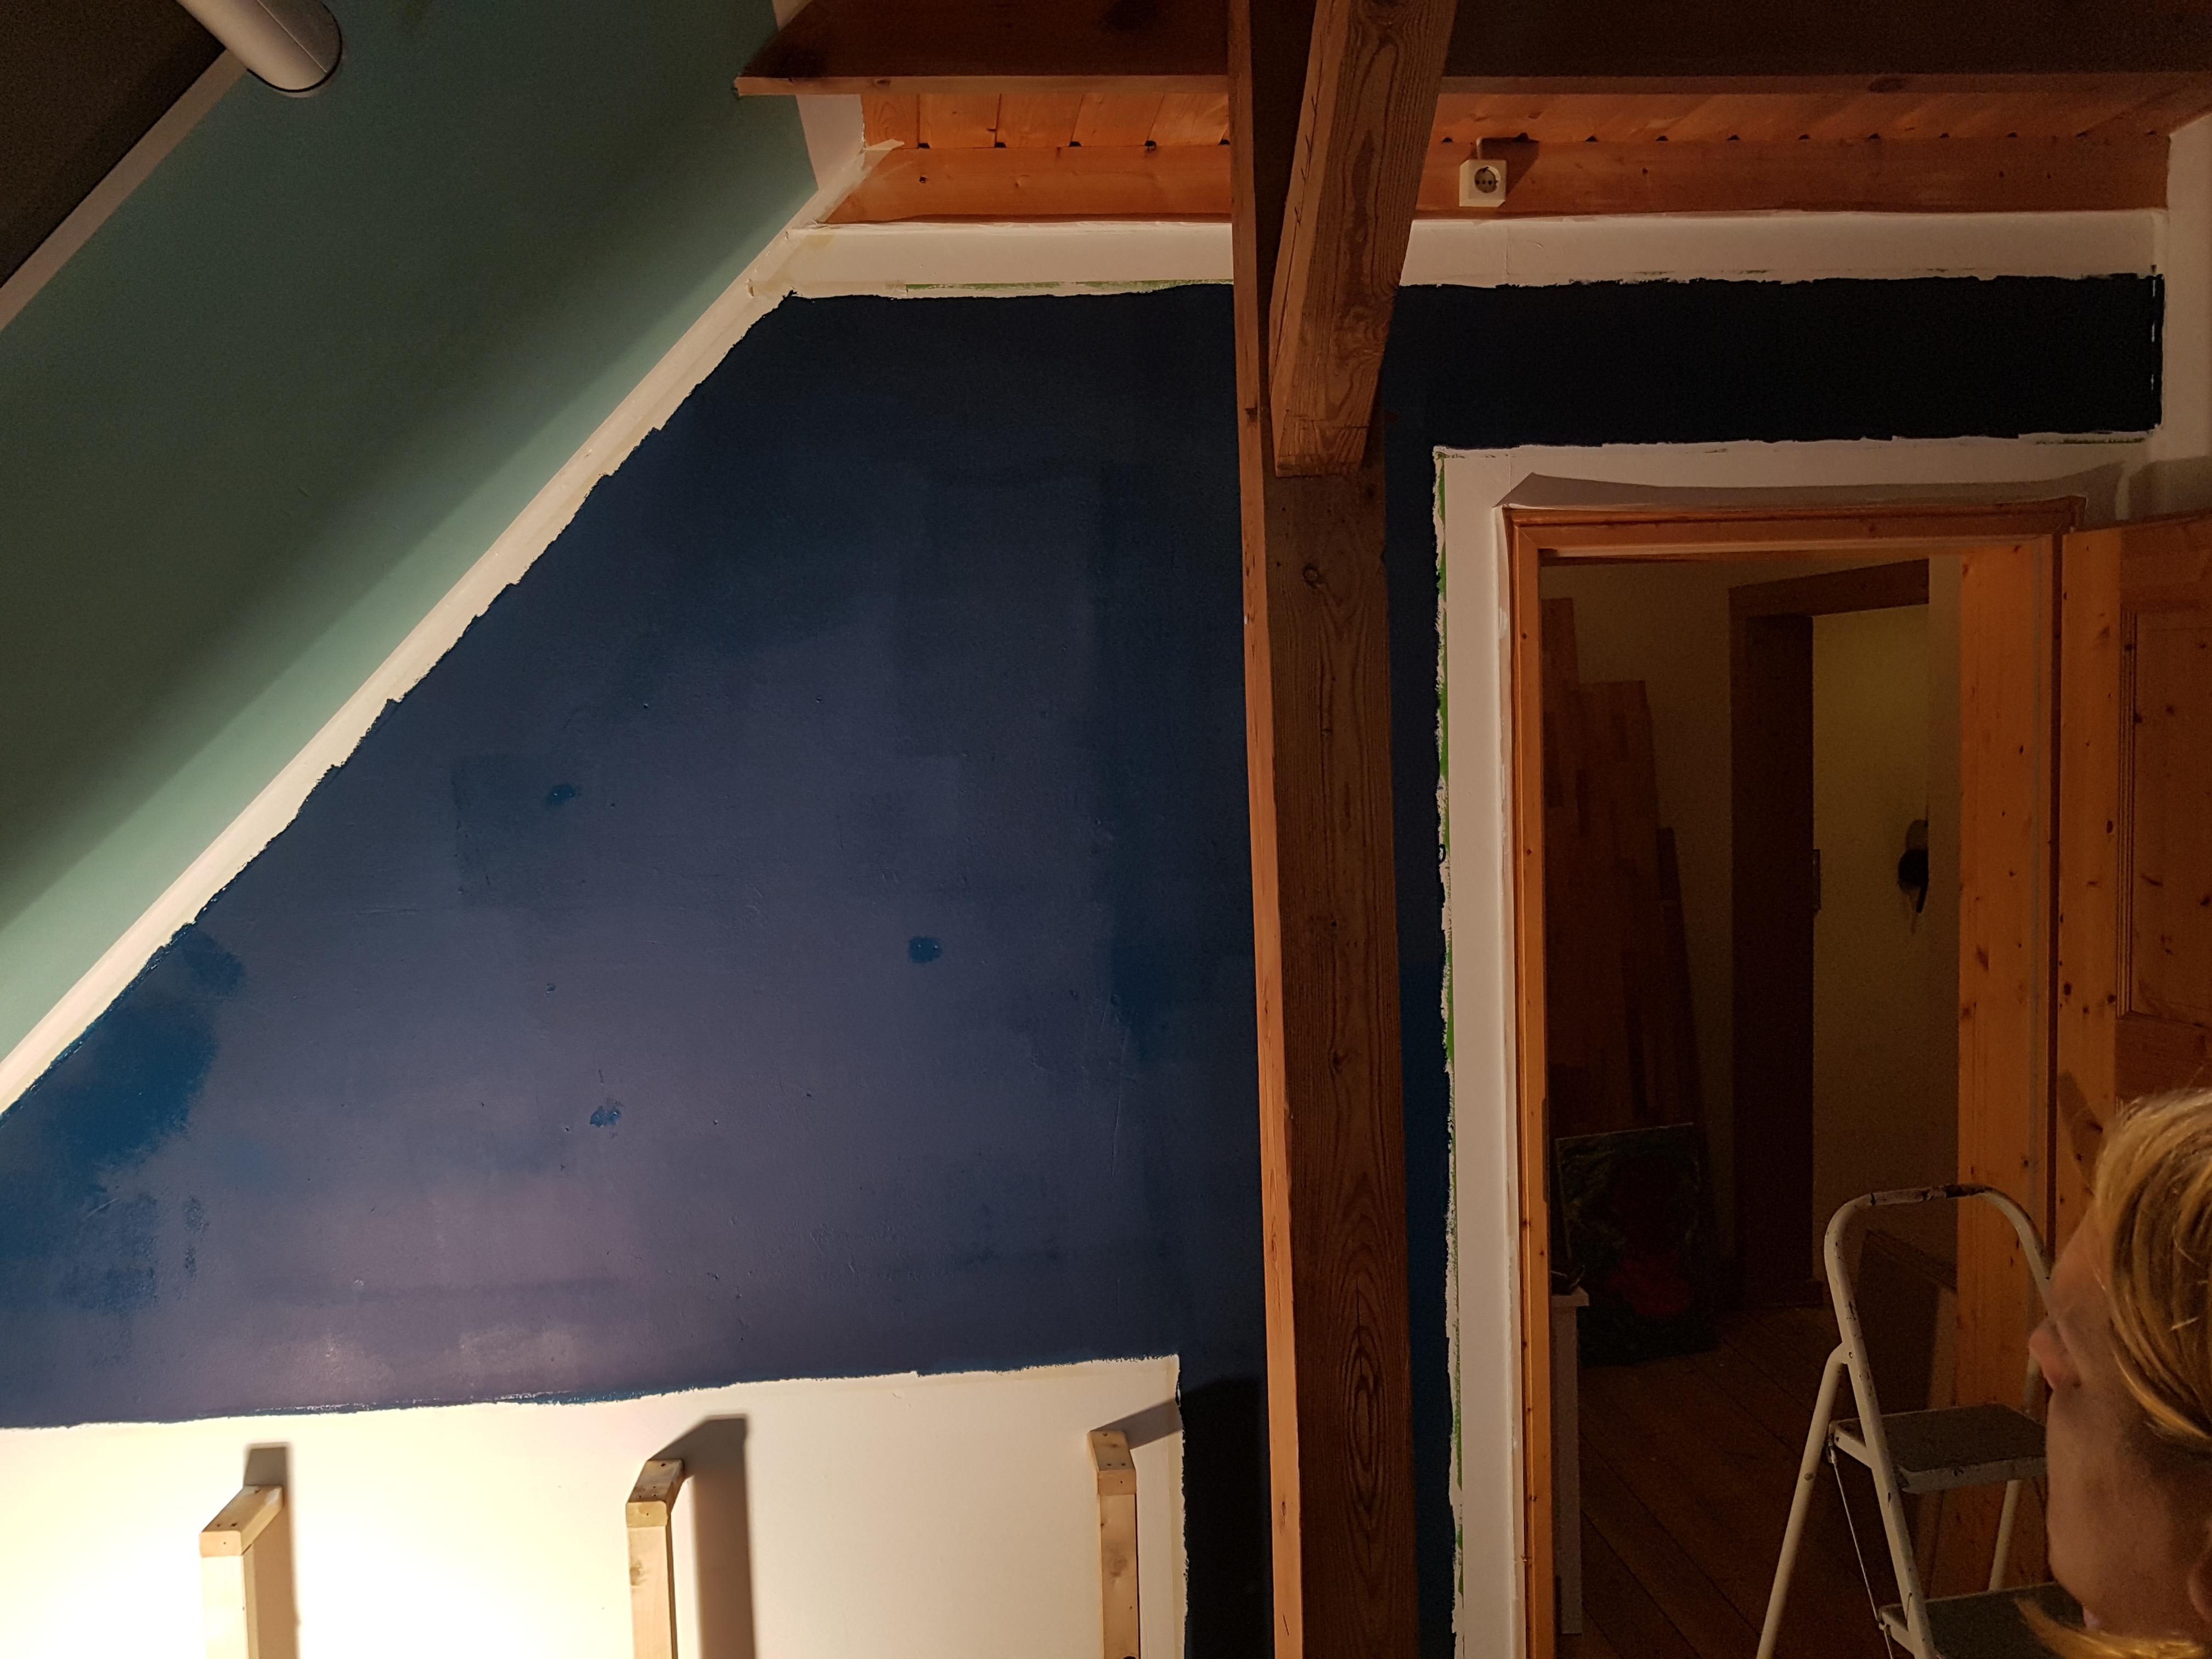 Bett neubau, Schlafzimmer renovieren | Sandro´s Bastelblog